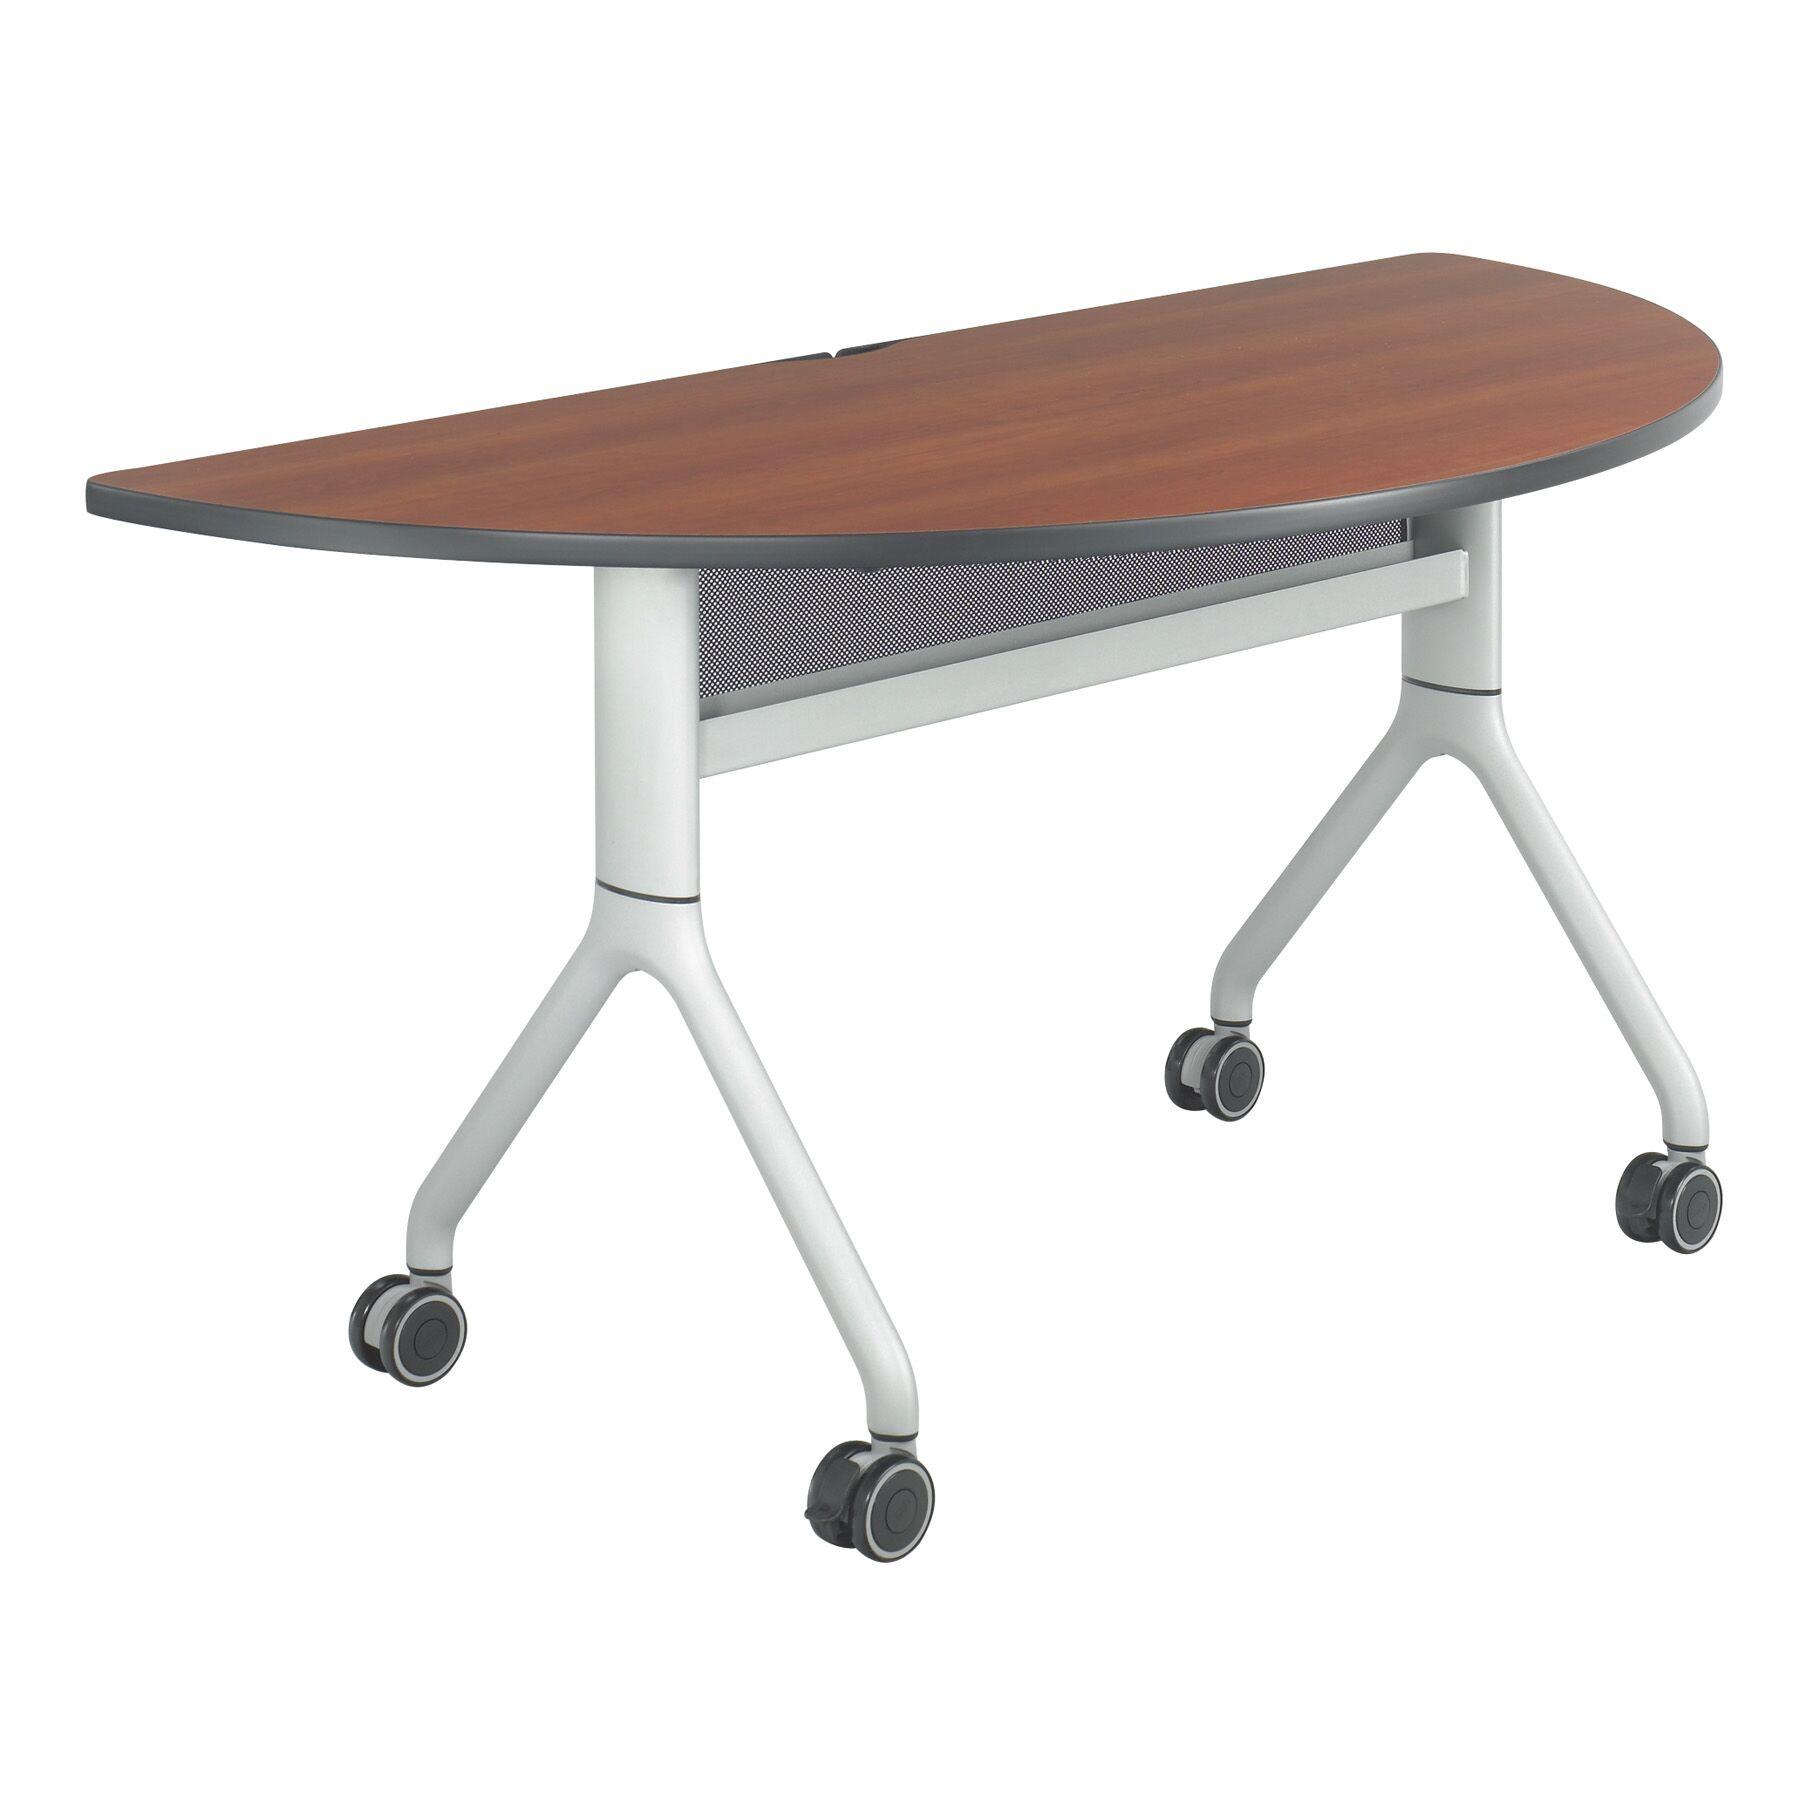 Rumba Training Table with Wheels Tabletop Finish: Cherry, Base Finish: Metallic Gray, Size: 60 x 30